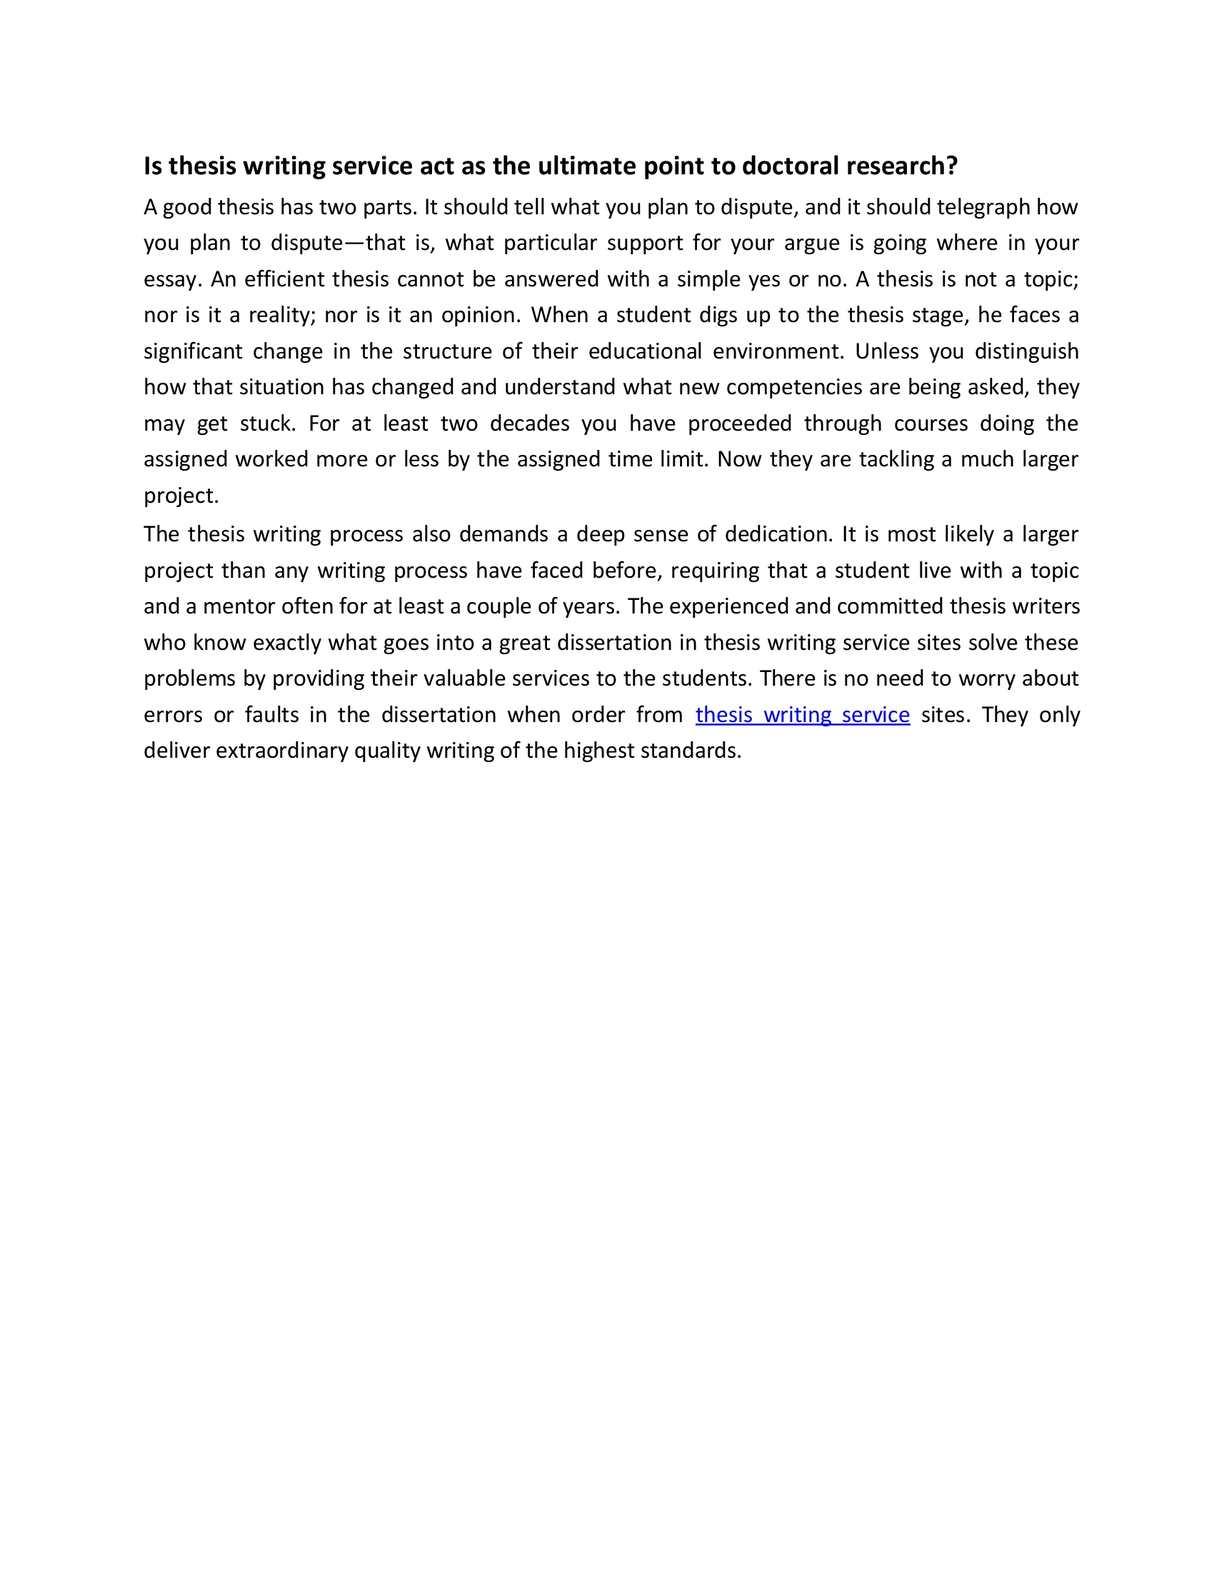 Doctoral dissertation enhancement projects ddep